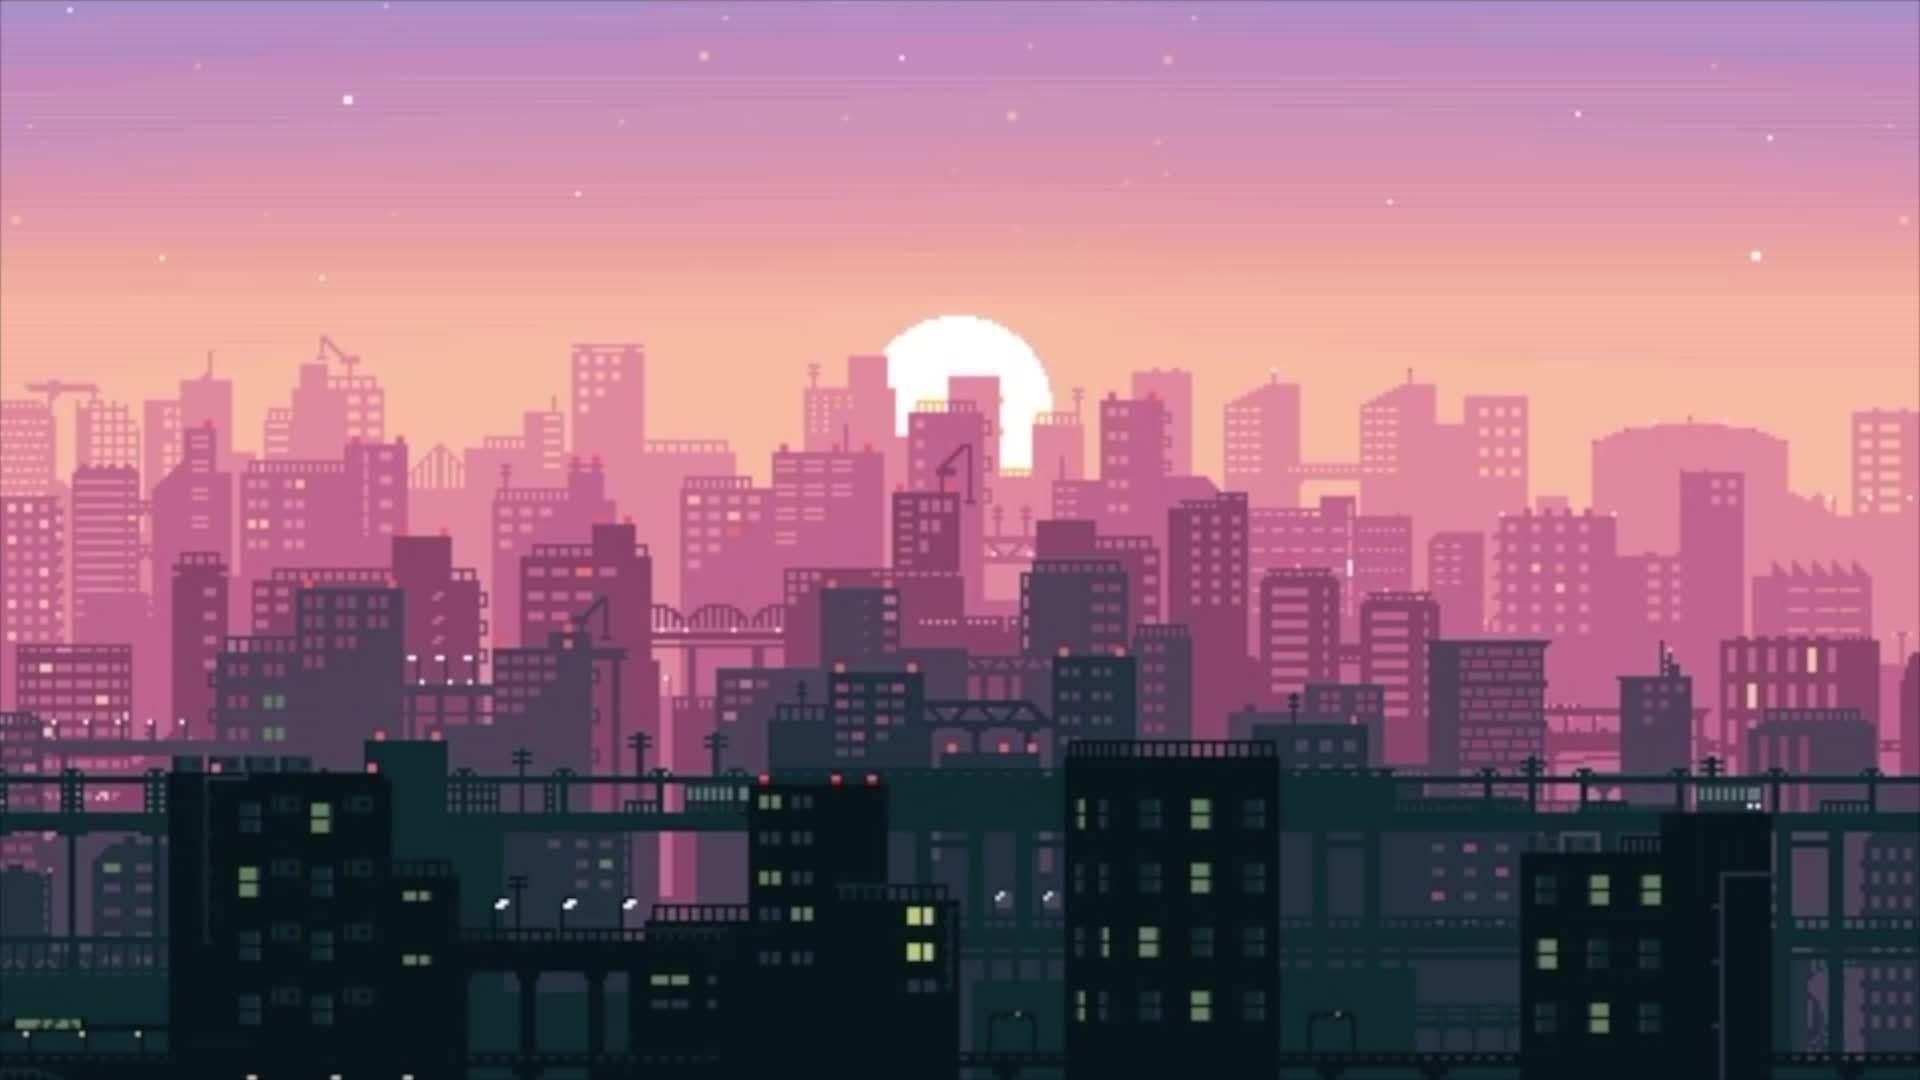 Anime Lo-fi Hip Hop Ps4 Wallpapers